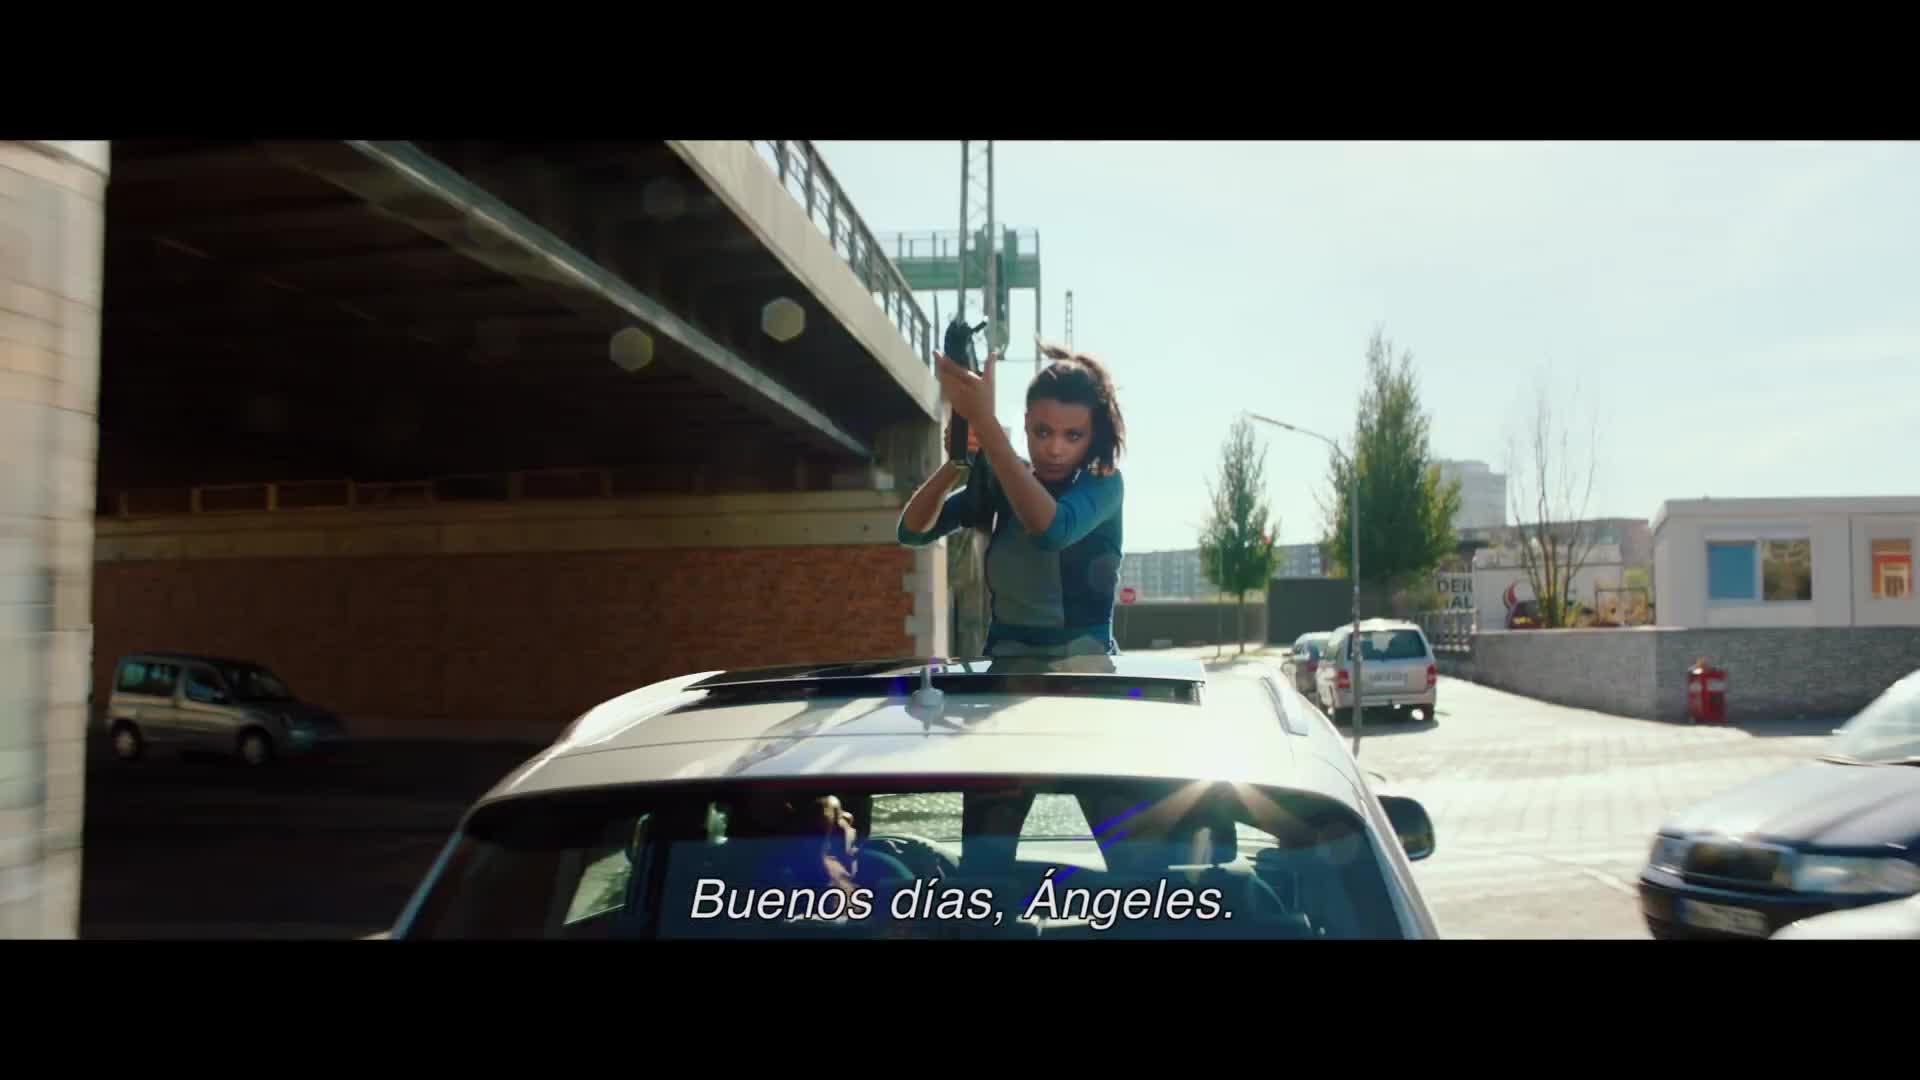 Charlie's Angels - TV Spot #1 [HD] screen capture